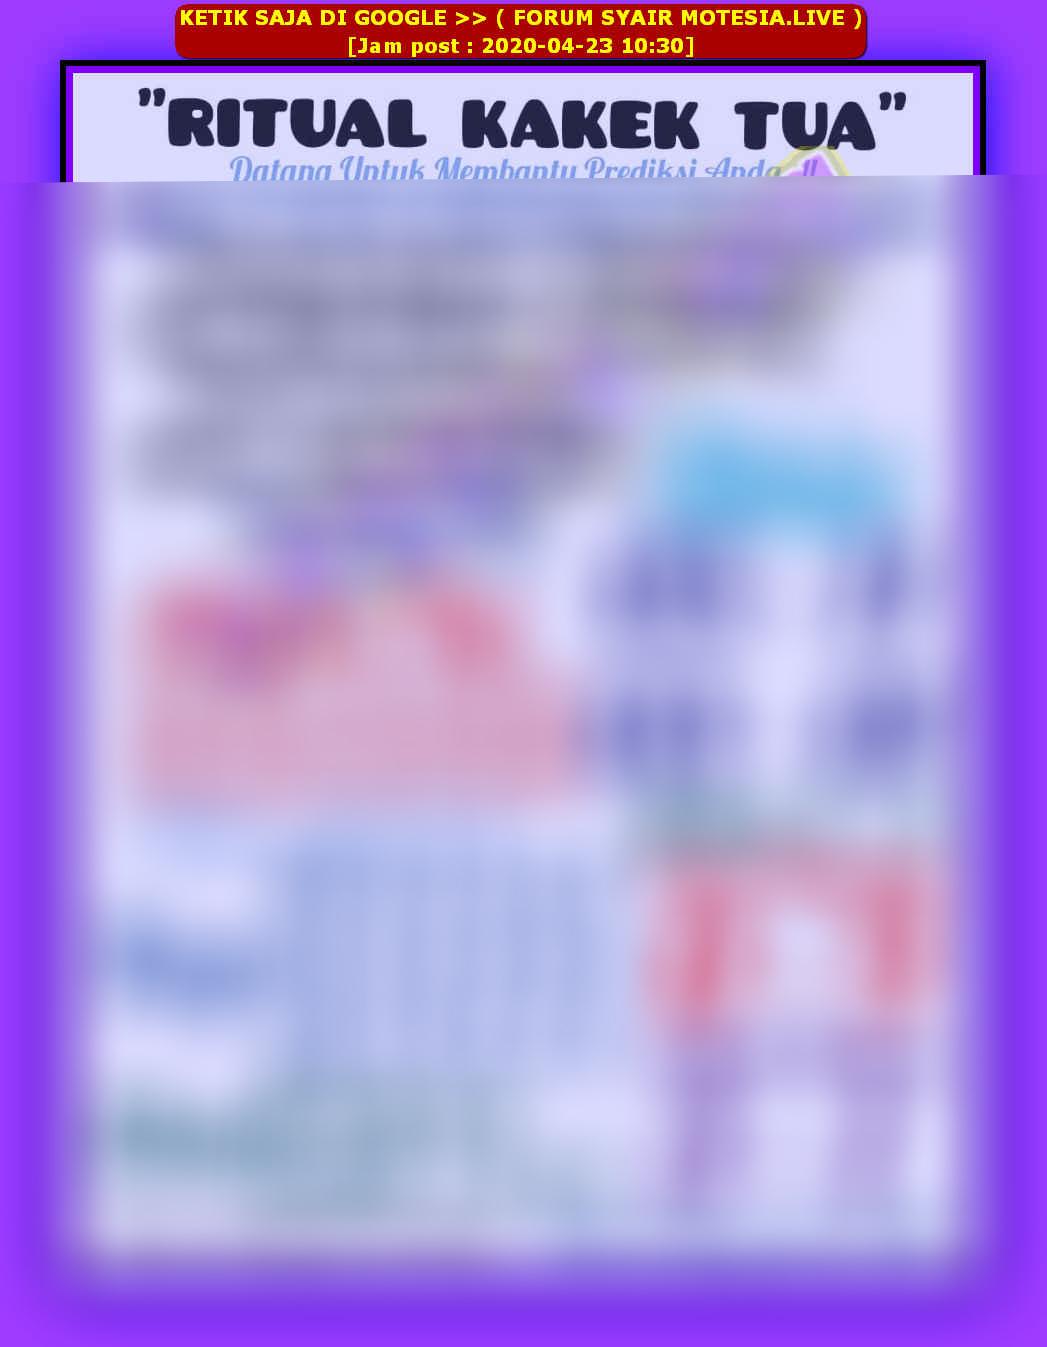 Kode syair Sydney Rabu 29 April 2020 18